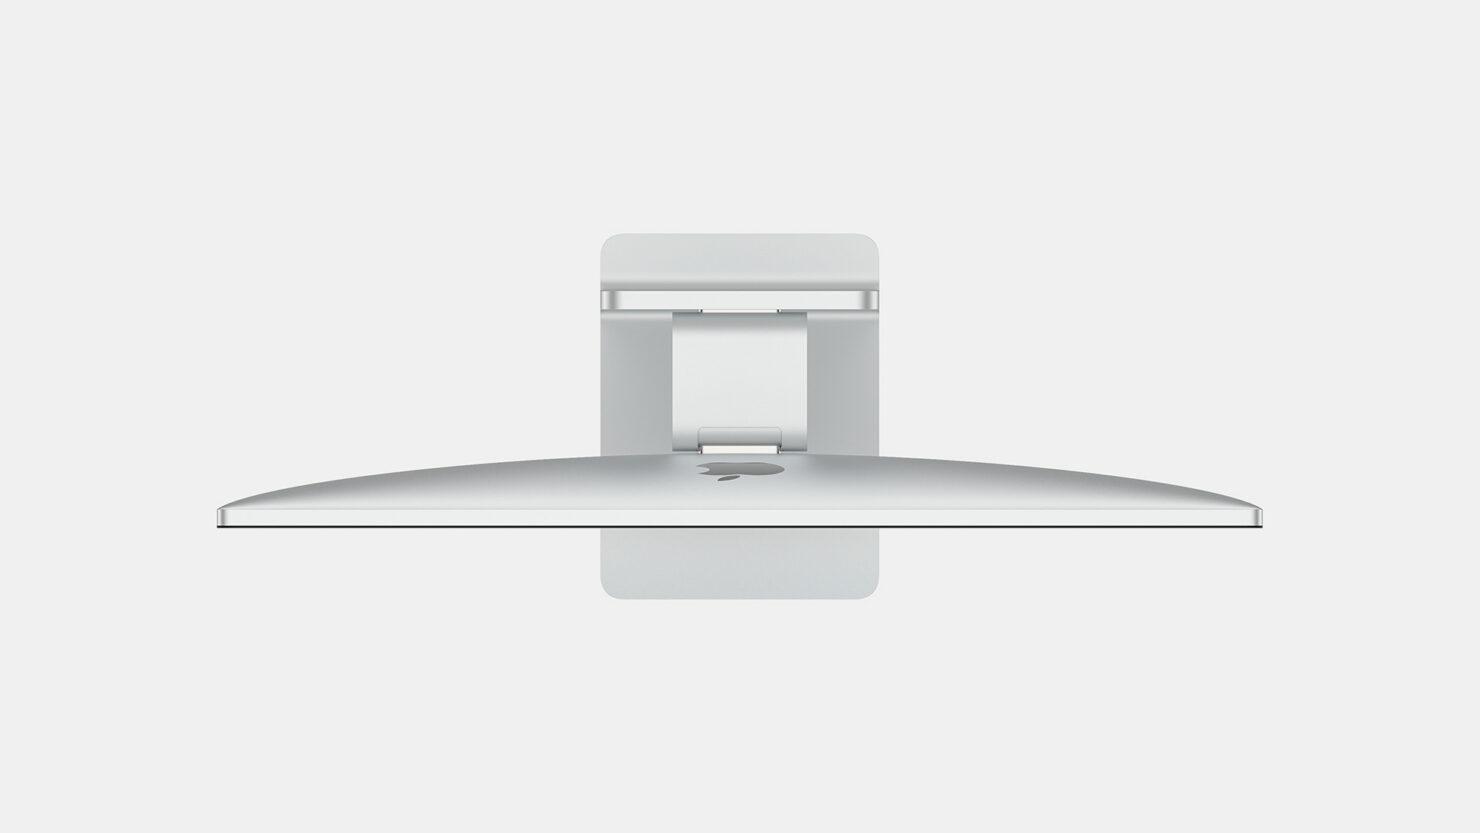 imac-concept-resembling-pro-display-xdr-1